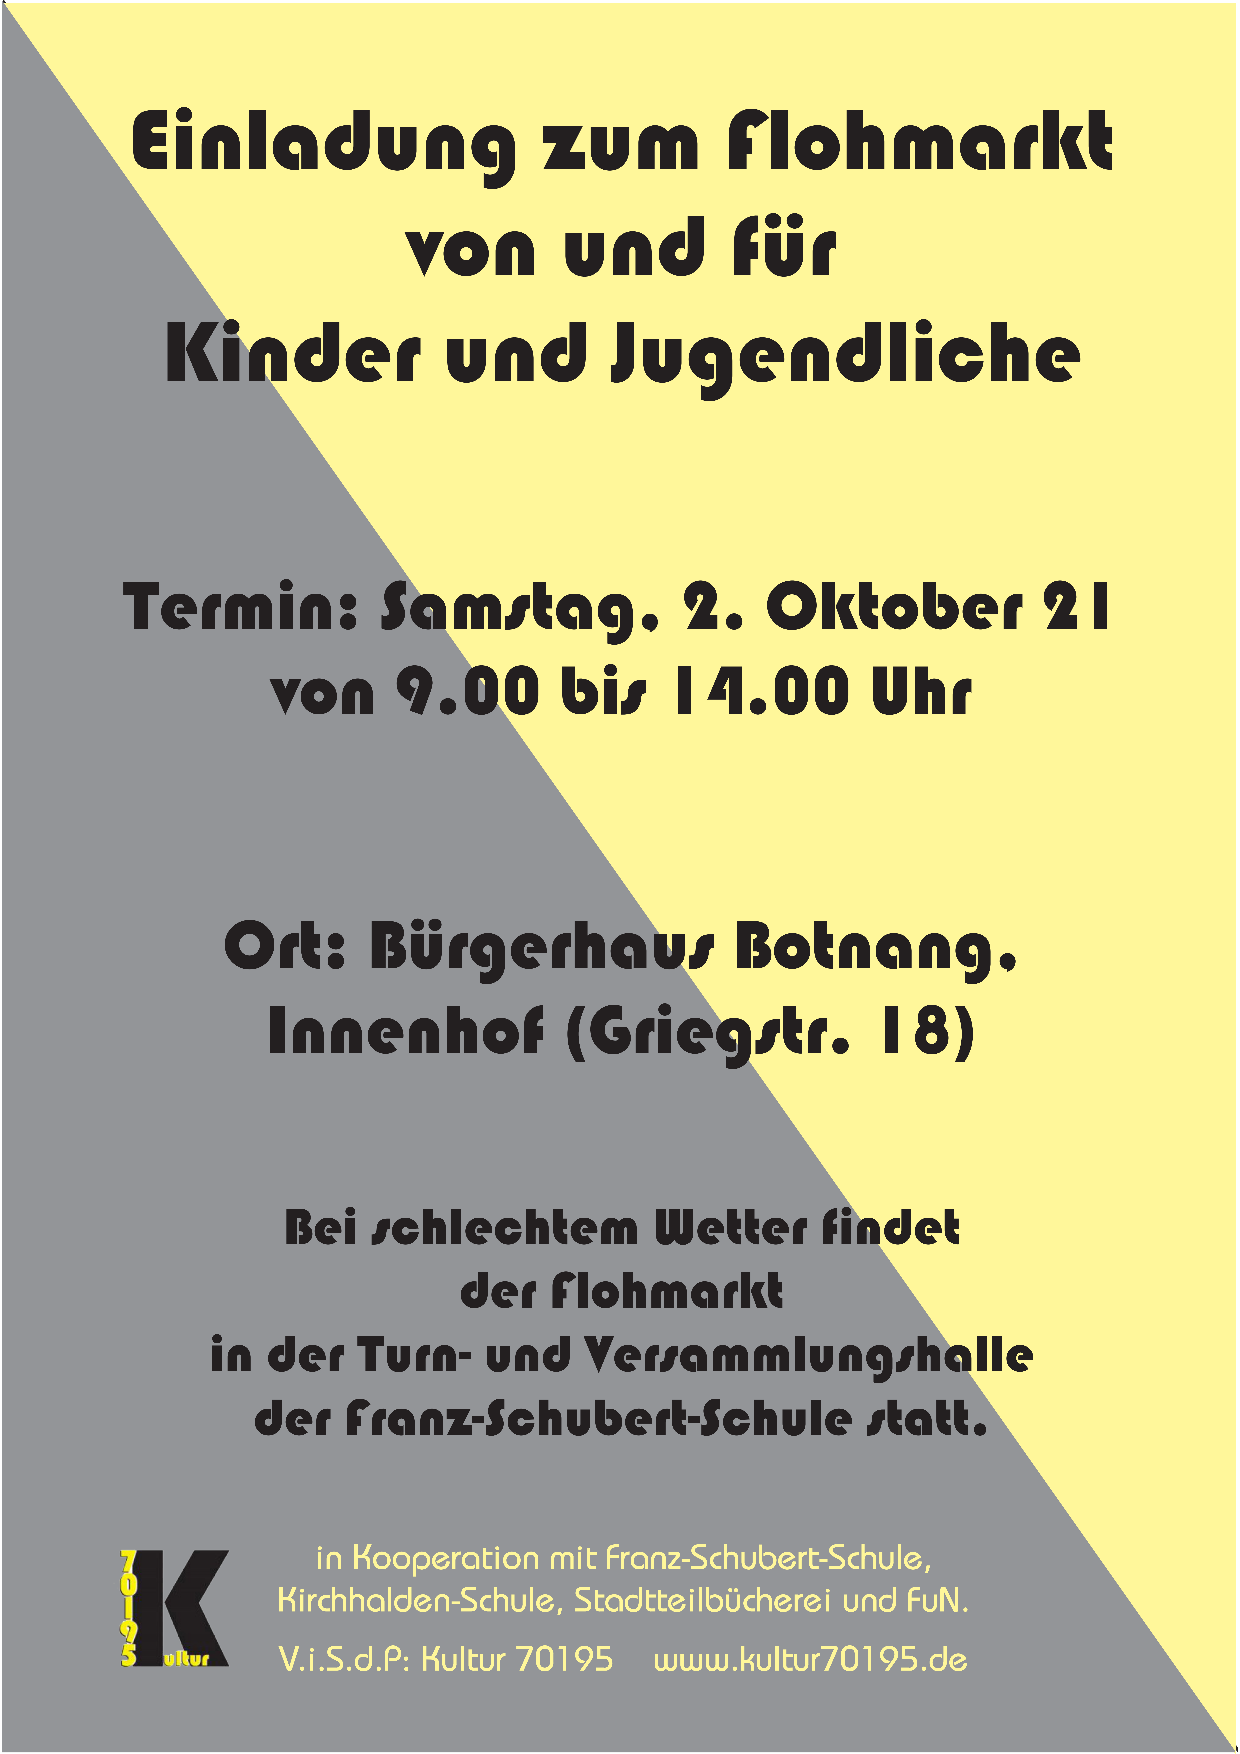 2021-September-Kinderflohmarkt-Kulturverein_Einladung_A5_Flohmarkt